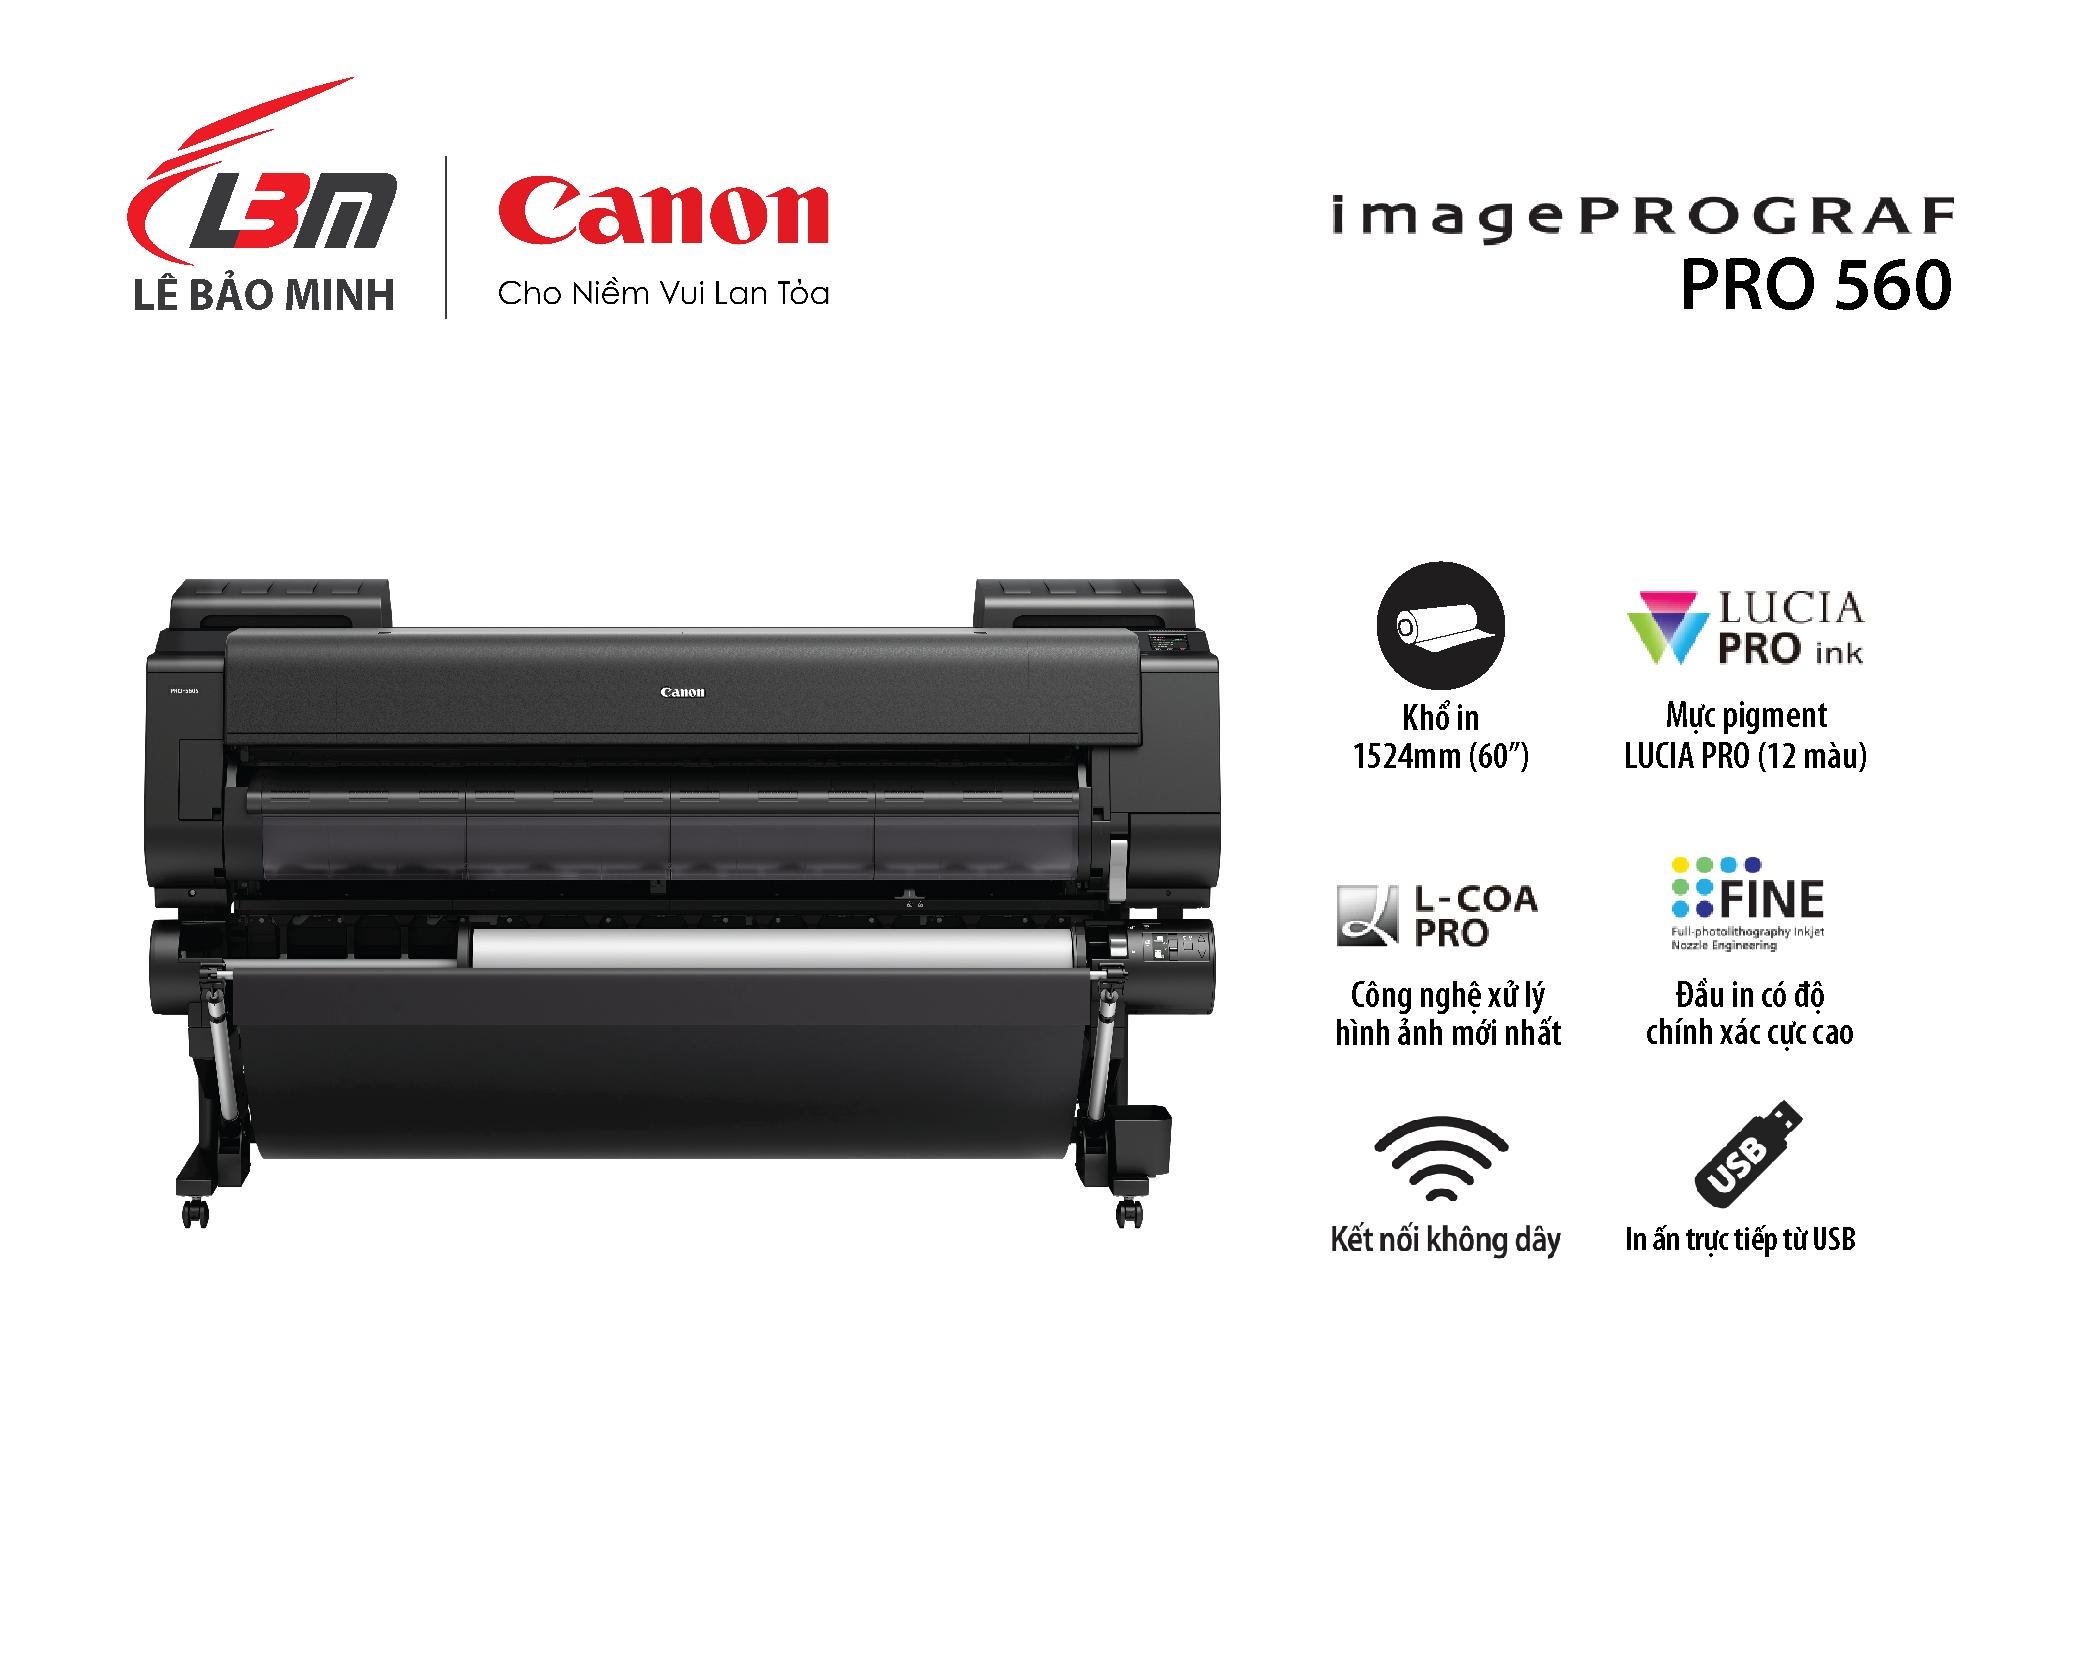 imagePROGRAF PRO-560 (12 màu mực)